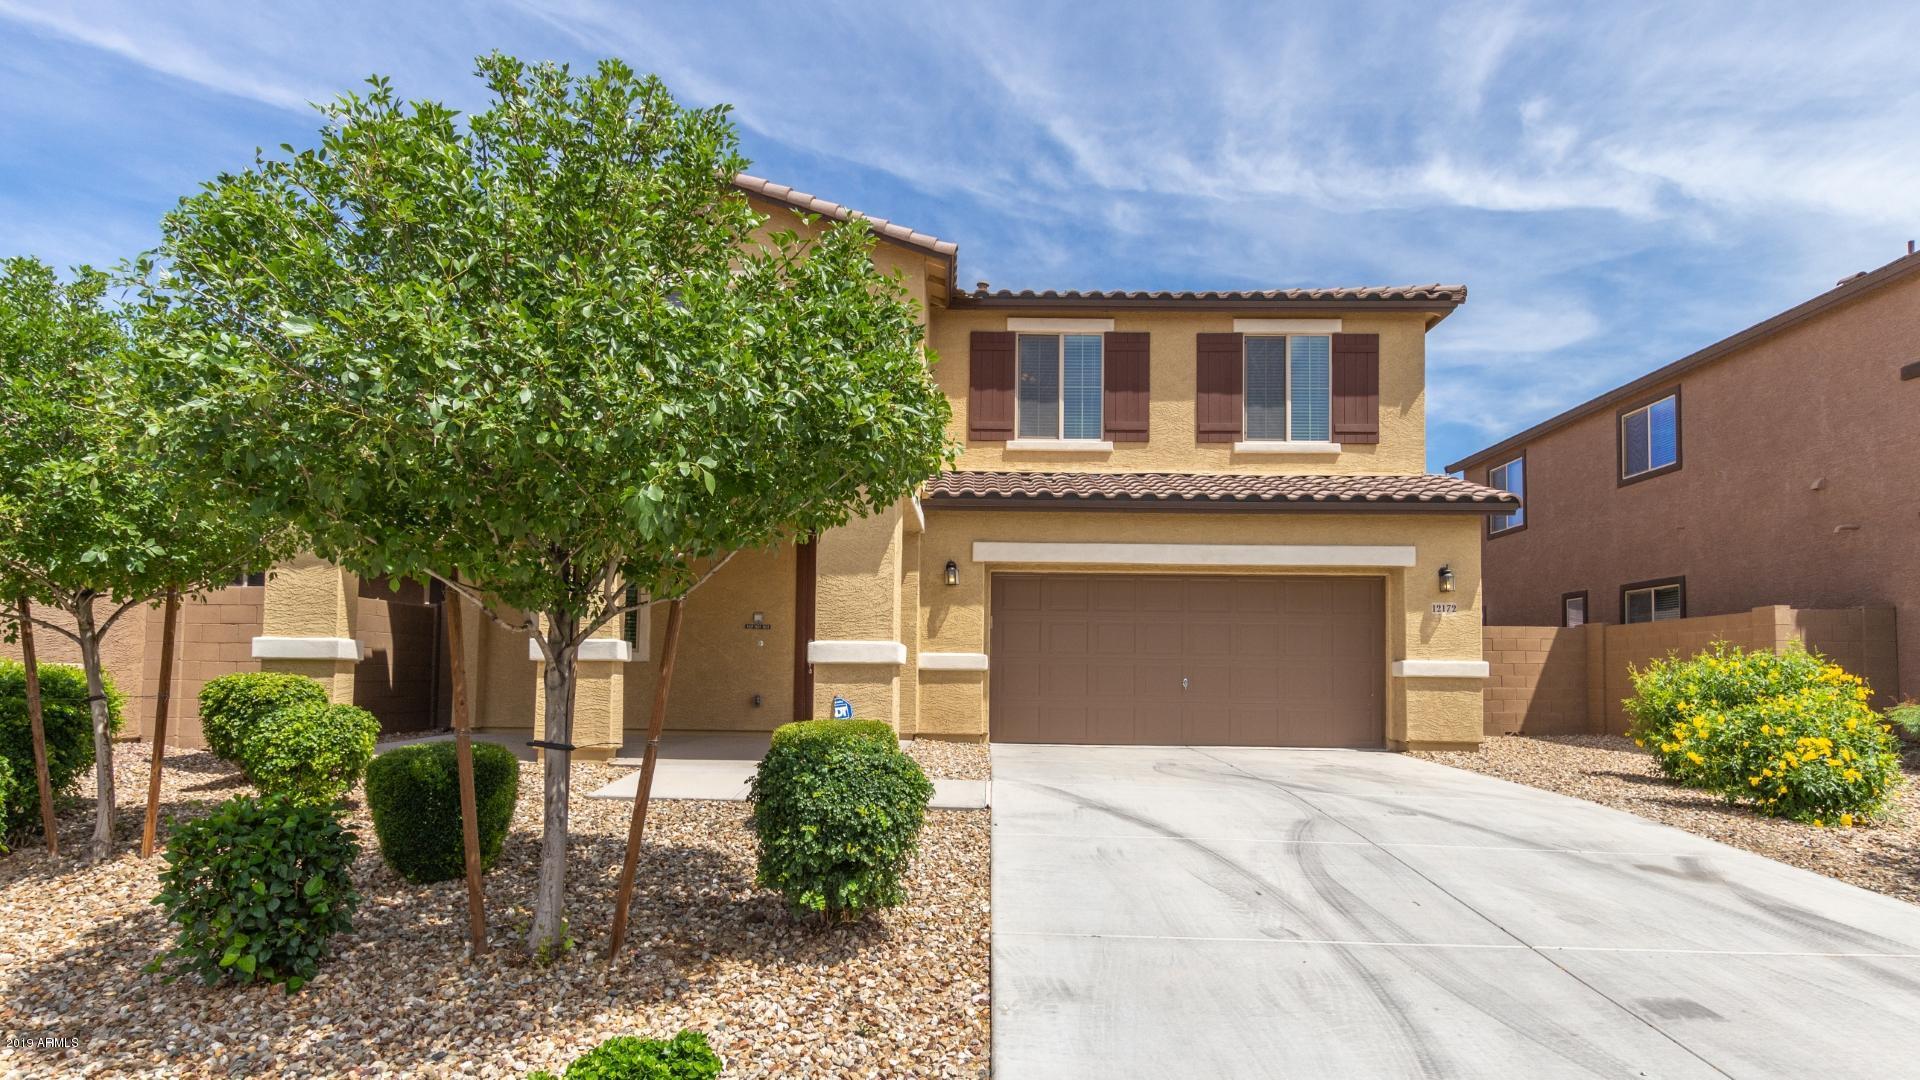 Photo of 12172 W OVERLIN Lane, Avondale, AZ 85323